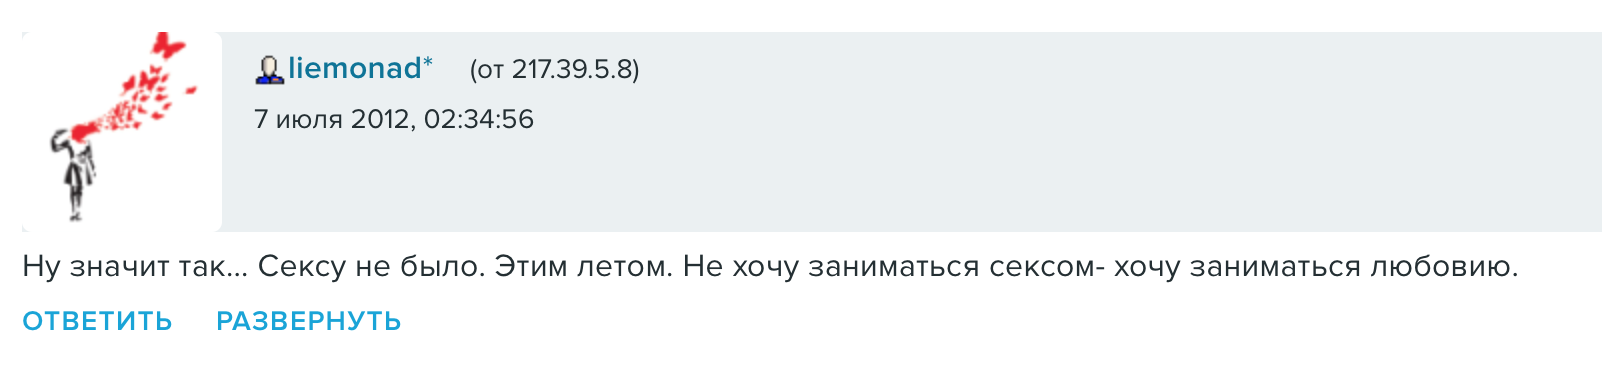 Снимок экрана 2015-01-03 в 9.58.21